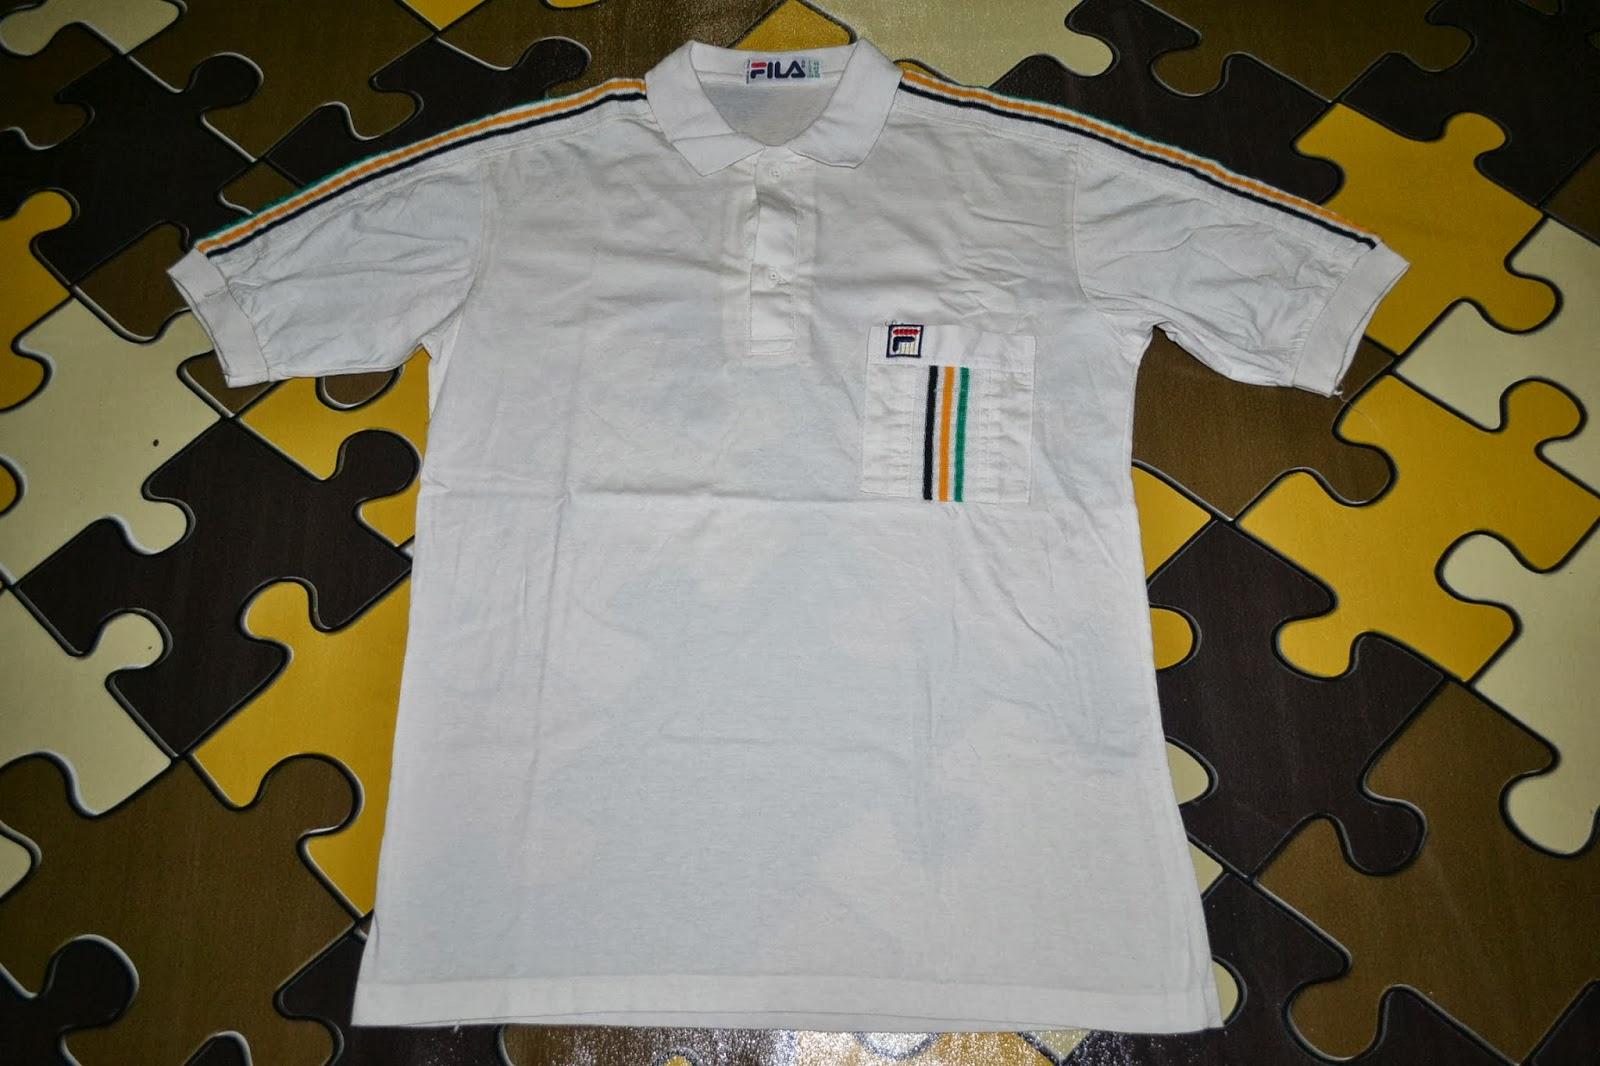 559ffa74574 OldSchoolZone: Vintage 80s FILA Made in Italy rare polo shirt